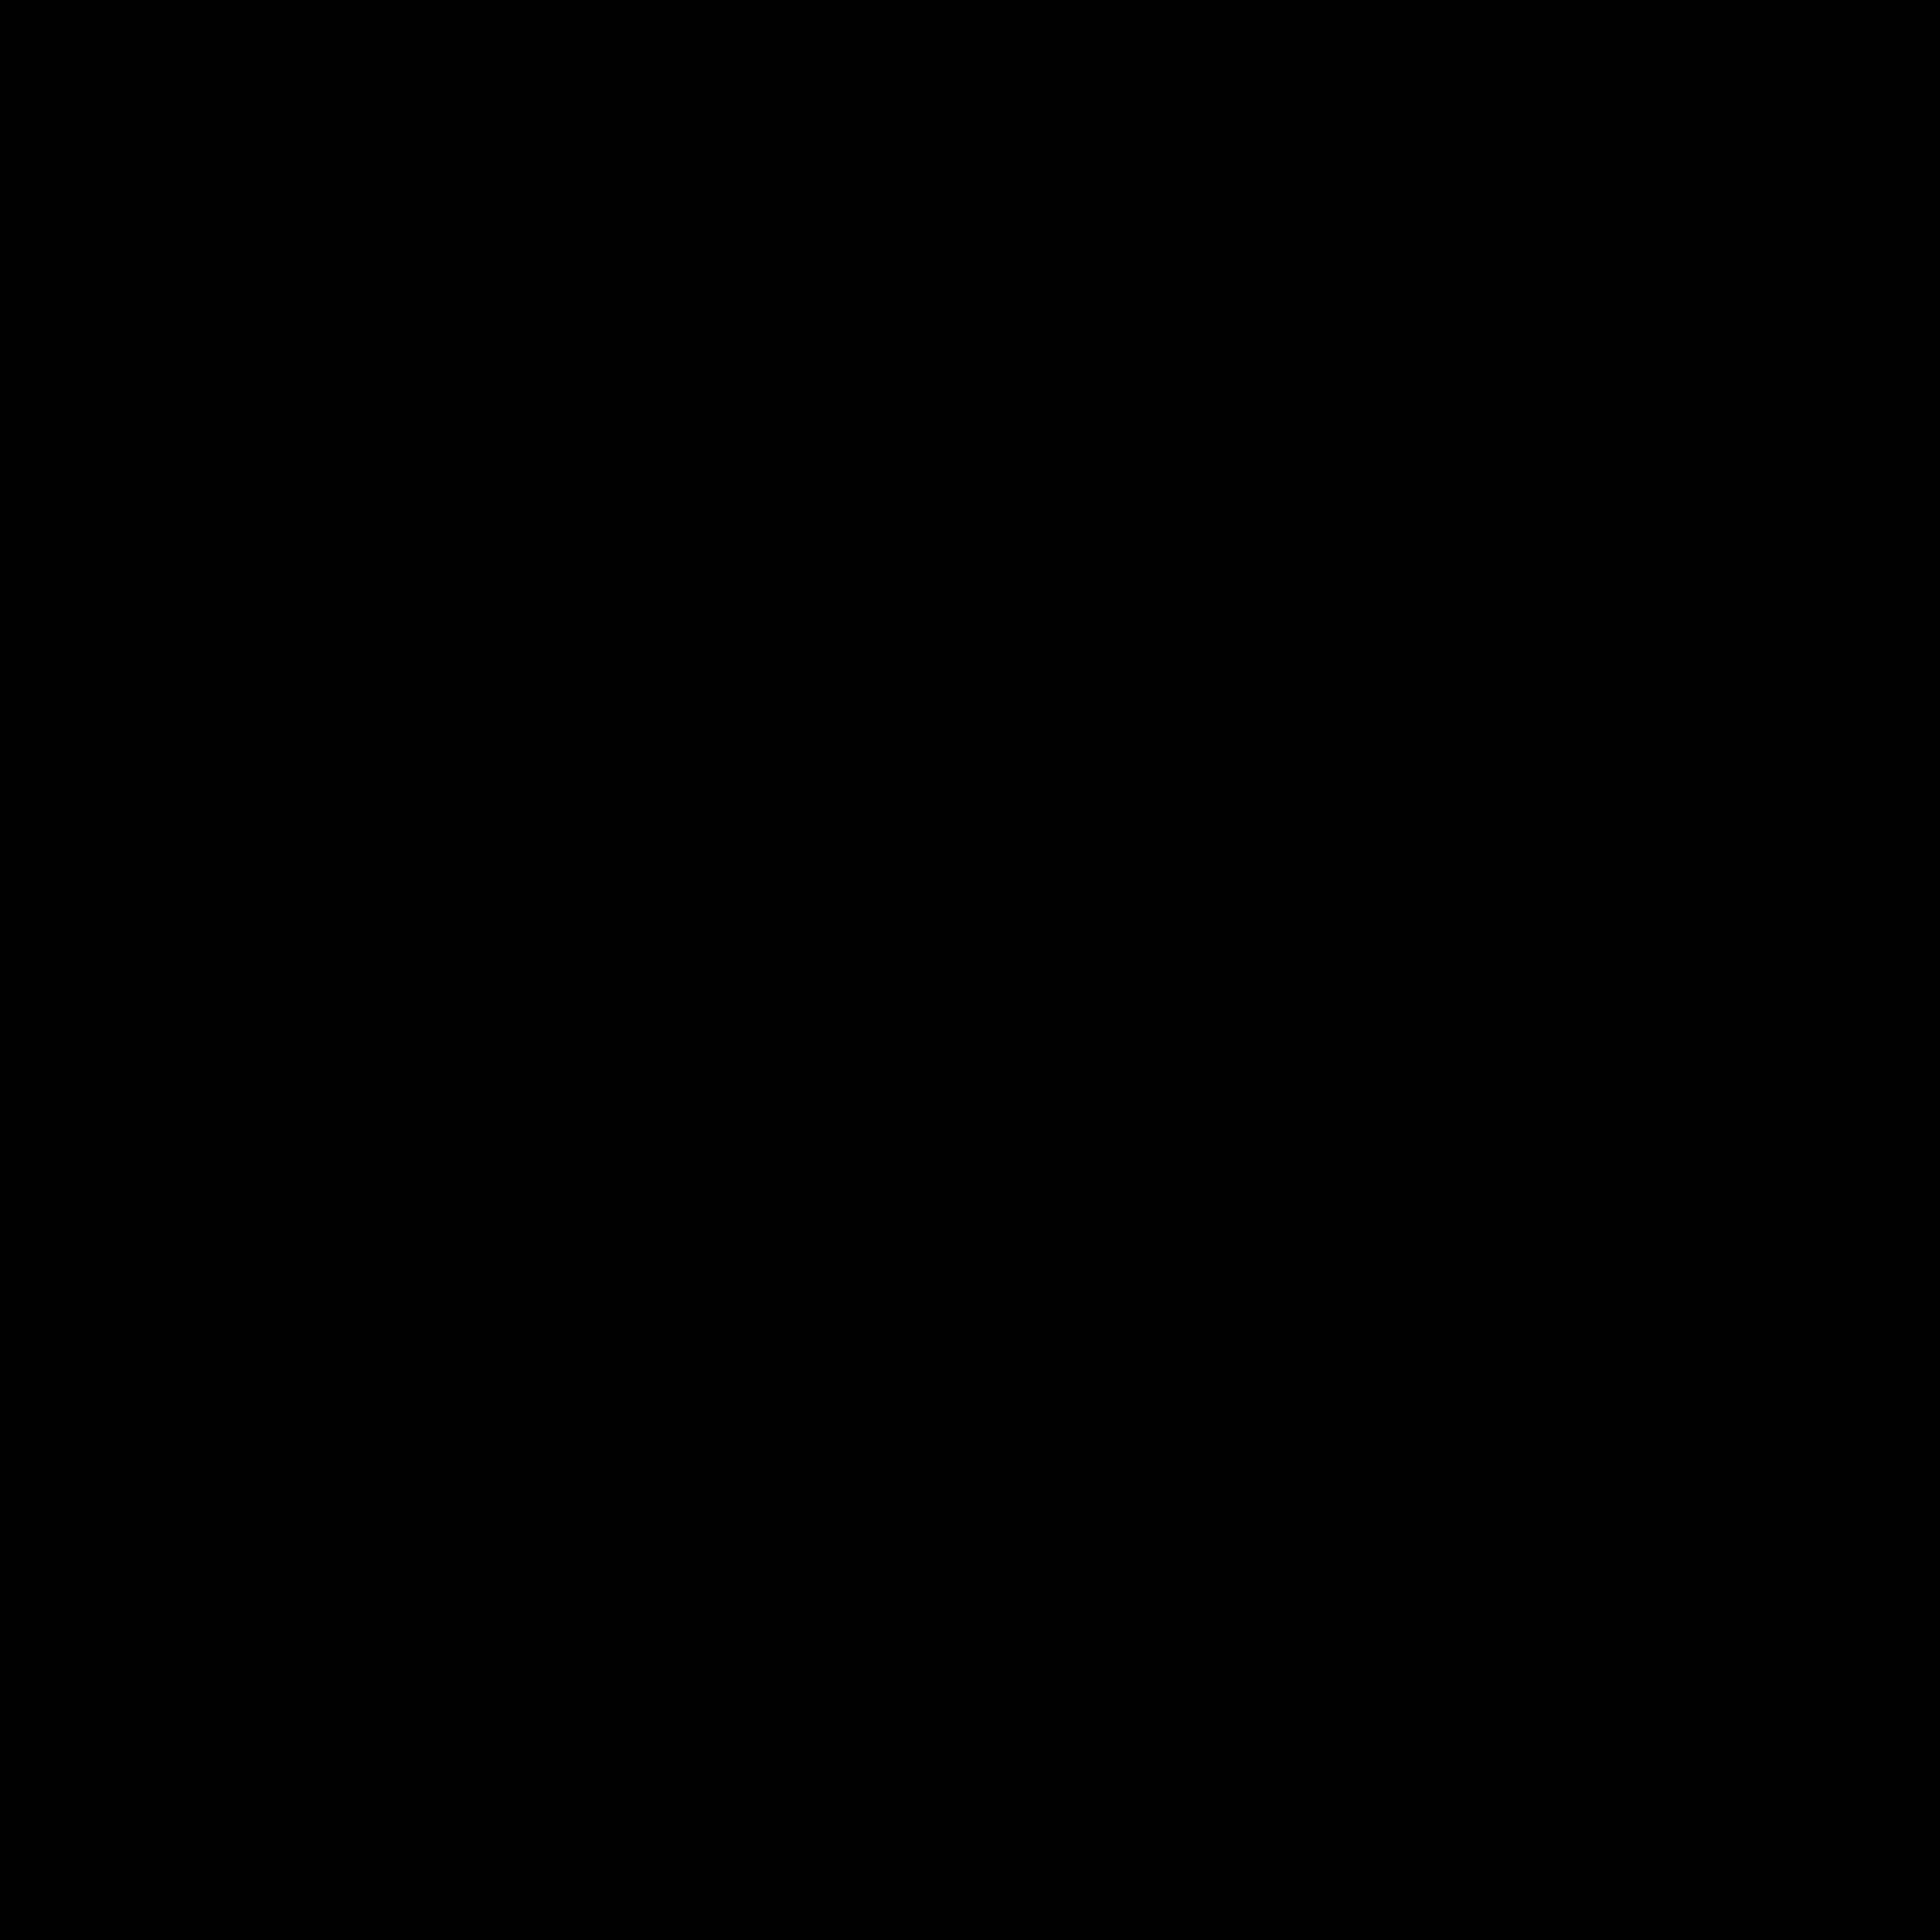 1Z4HBM0 Russell Athletic Dri-Power Fleece ¼ Zip Cadet